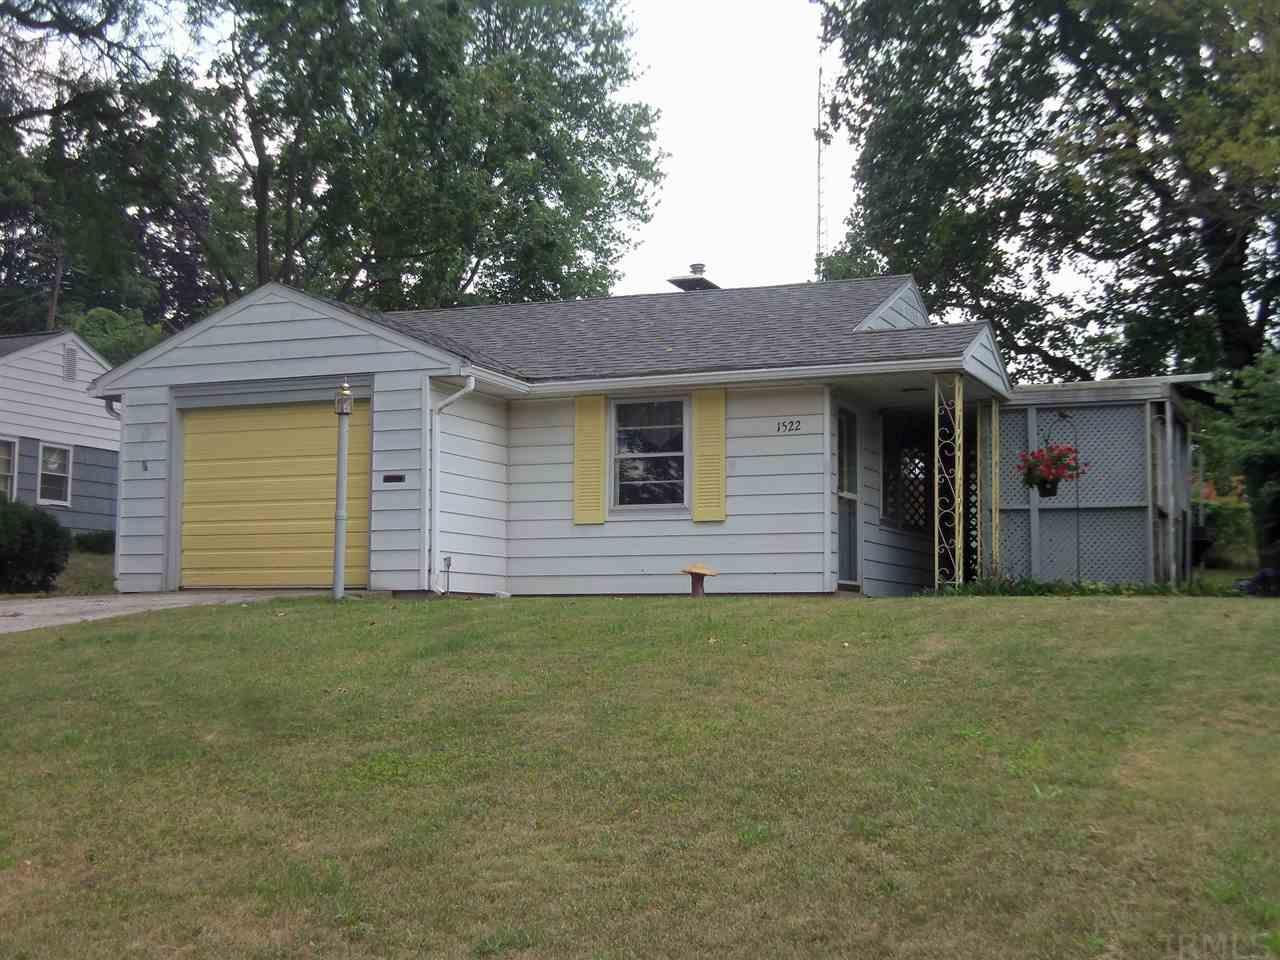 1522 Altgeld, South Bend, IN 46614